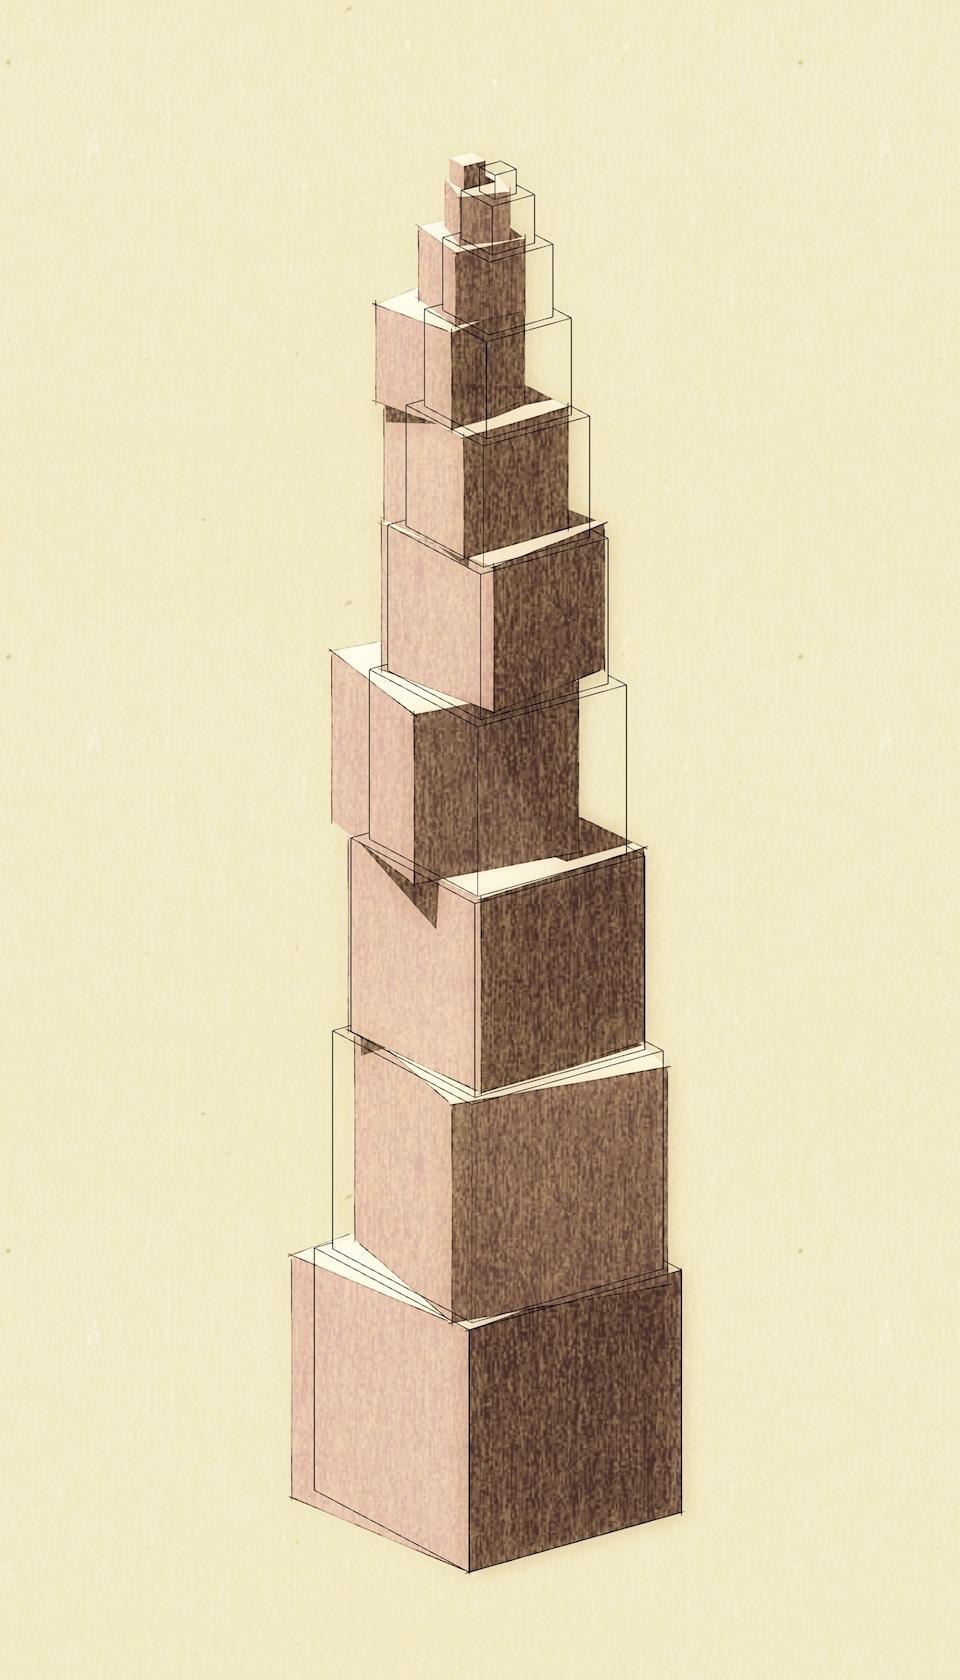 Pink Tower_Jumbled copy.jpg